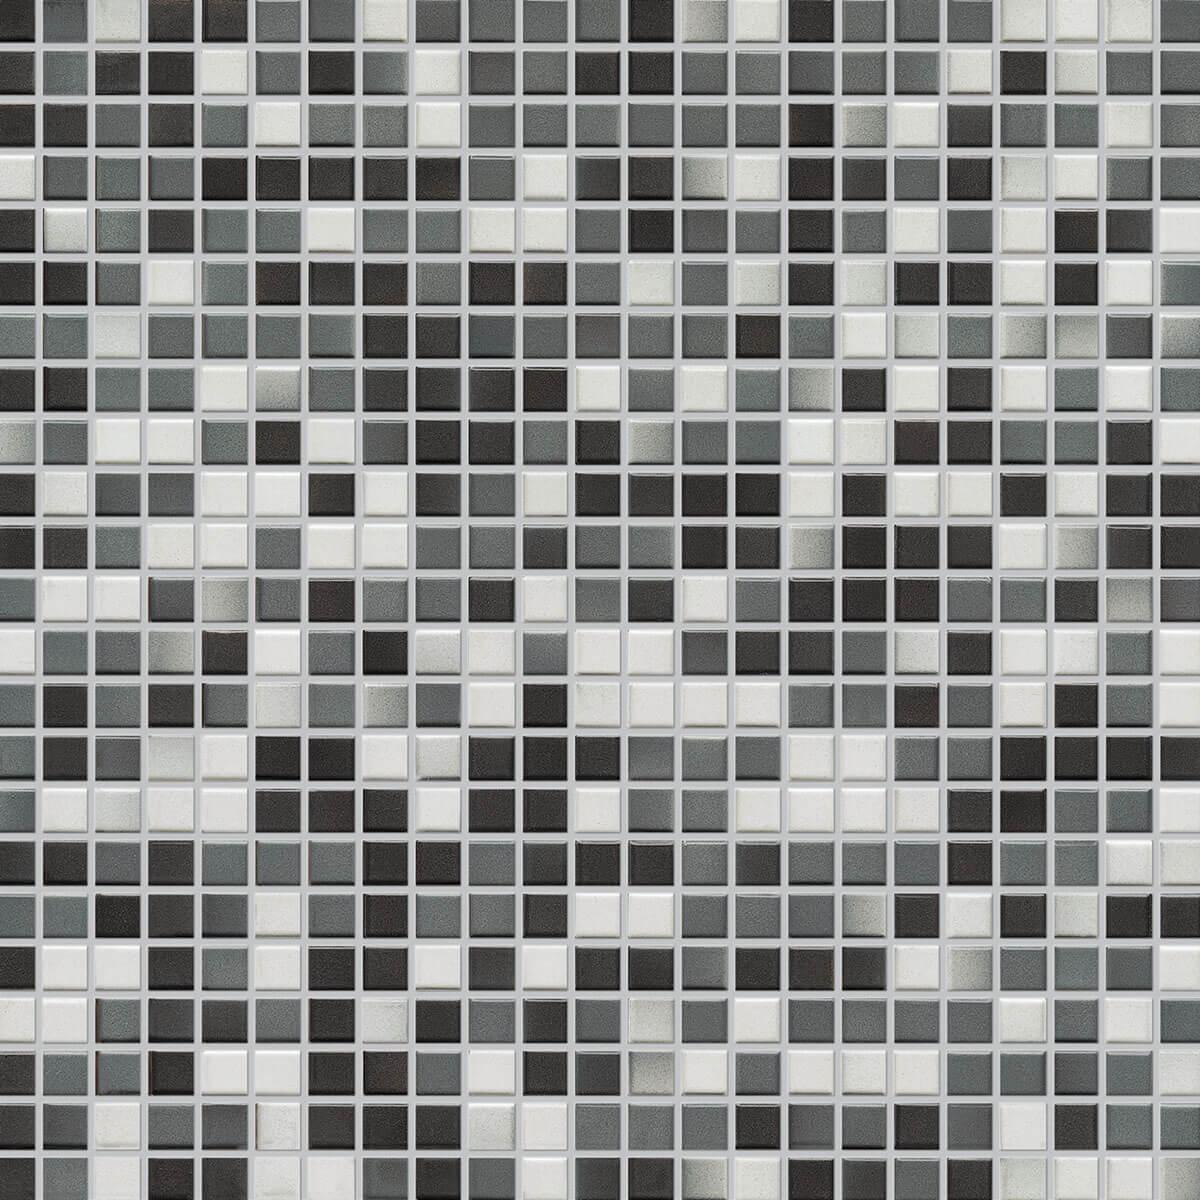 Agrob Buchtal Tiles - KLAY_Plural-_0003_GREY1X1-–-5750I-7150H-SPHERE-NEUTRAL